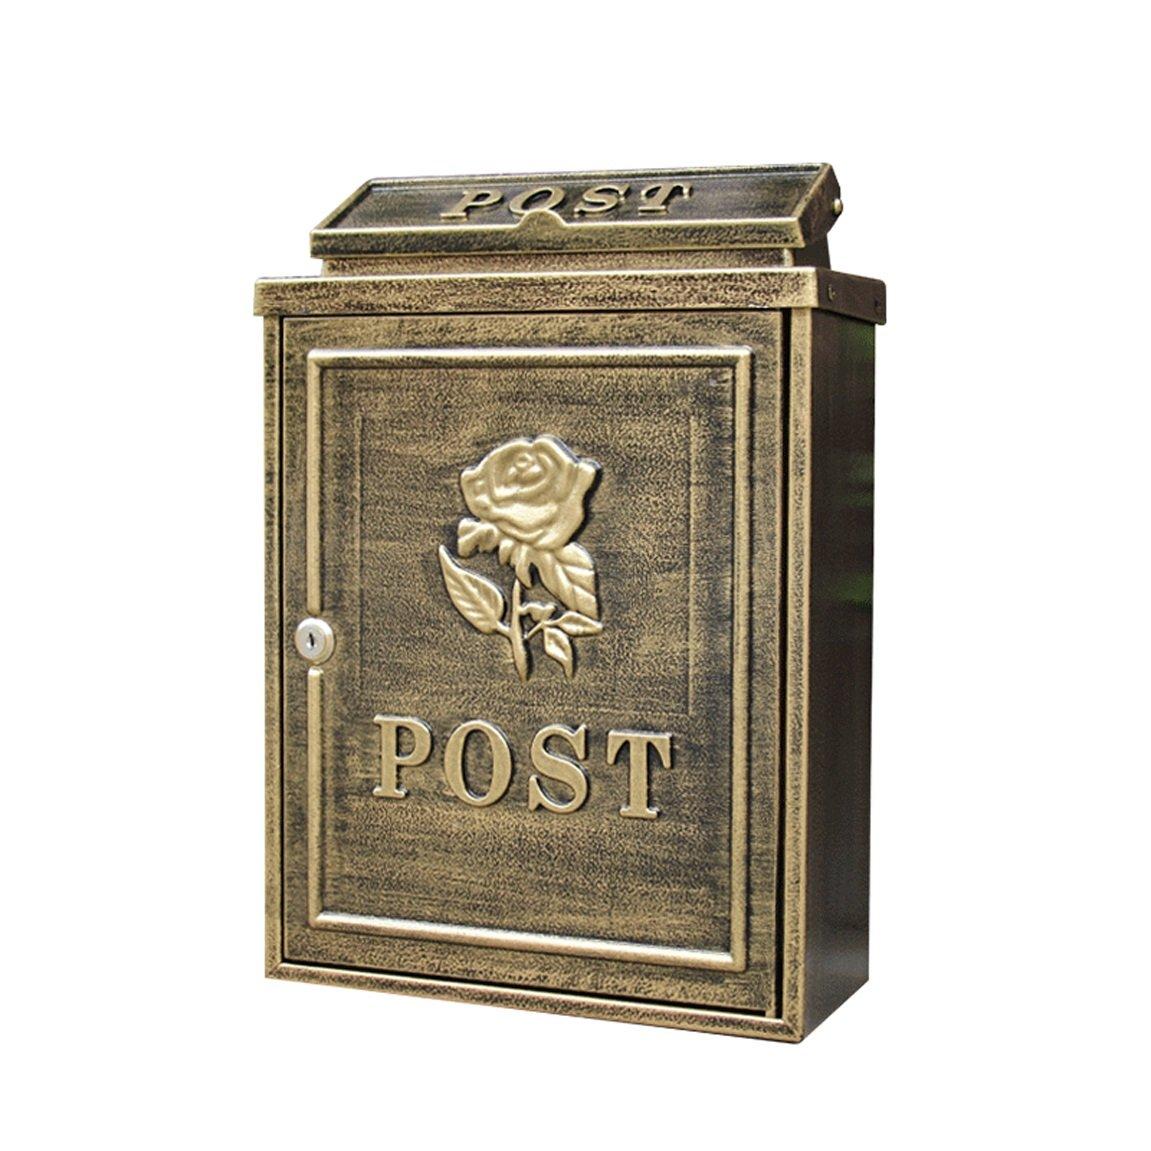 LRW ヨーロッパスタイルの郵便箱屋外の雨の証拠の水の倉庫の郵便受けの壁の壁のロックのポスト箱Idyllic創造的な郵便の箱、アンティークの黄金のローズ、壁の装飾   B07HP6R5Y1